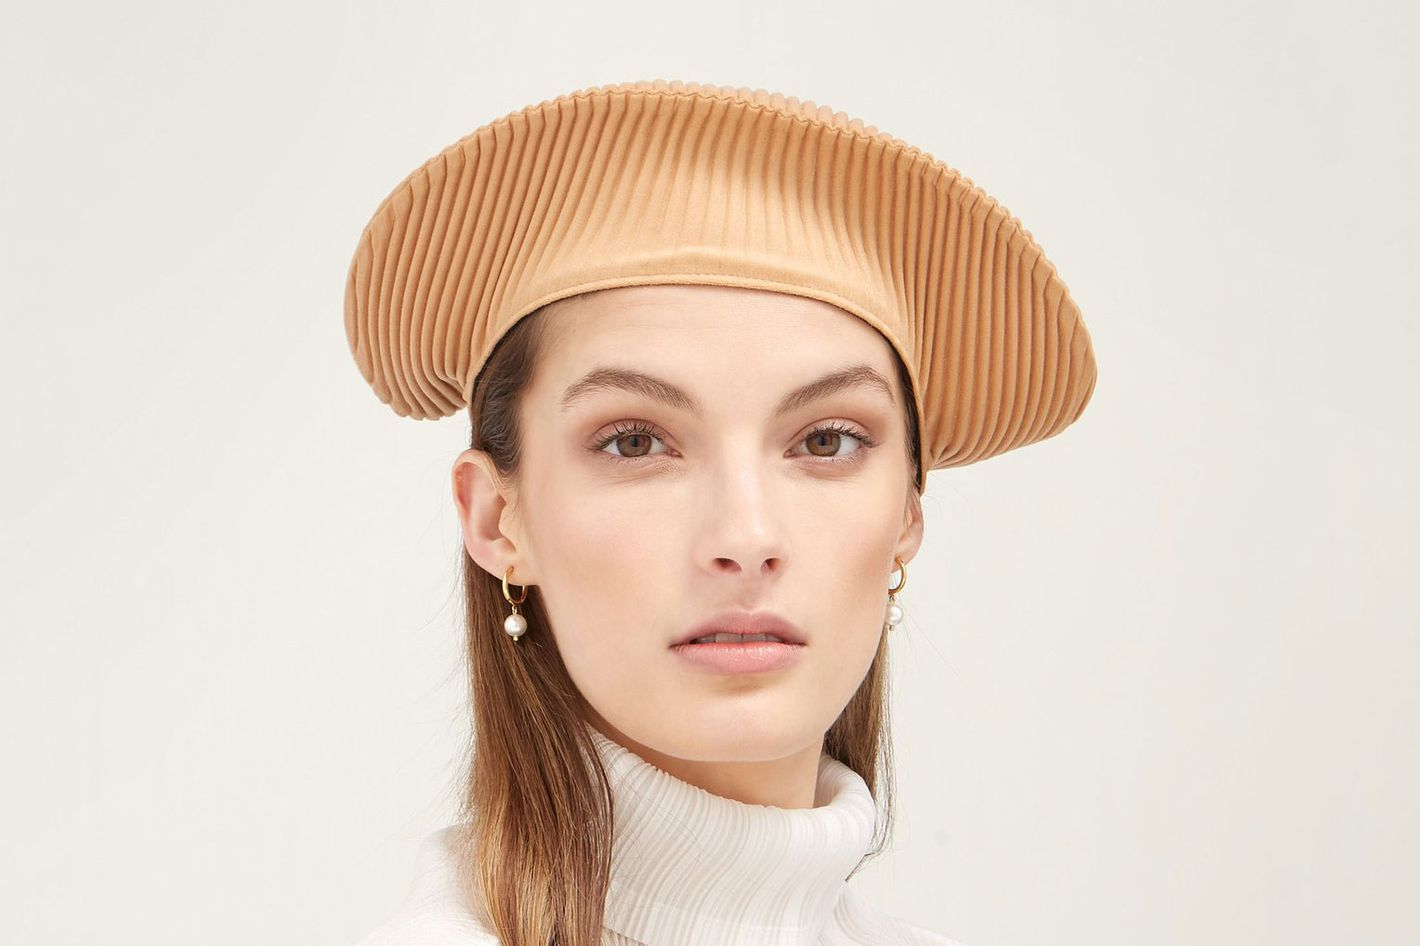 7cb1b3df23e 15 Women on Ways to Wear Hats This Winter